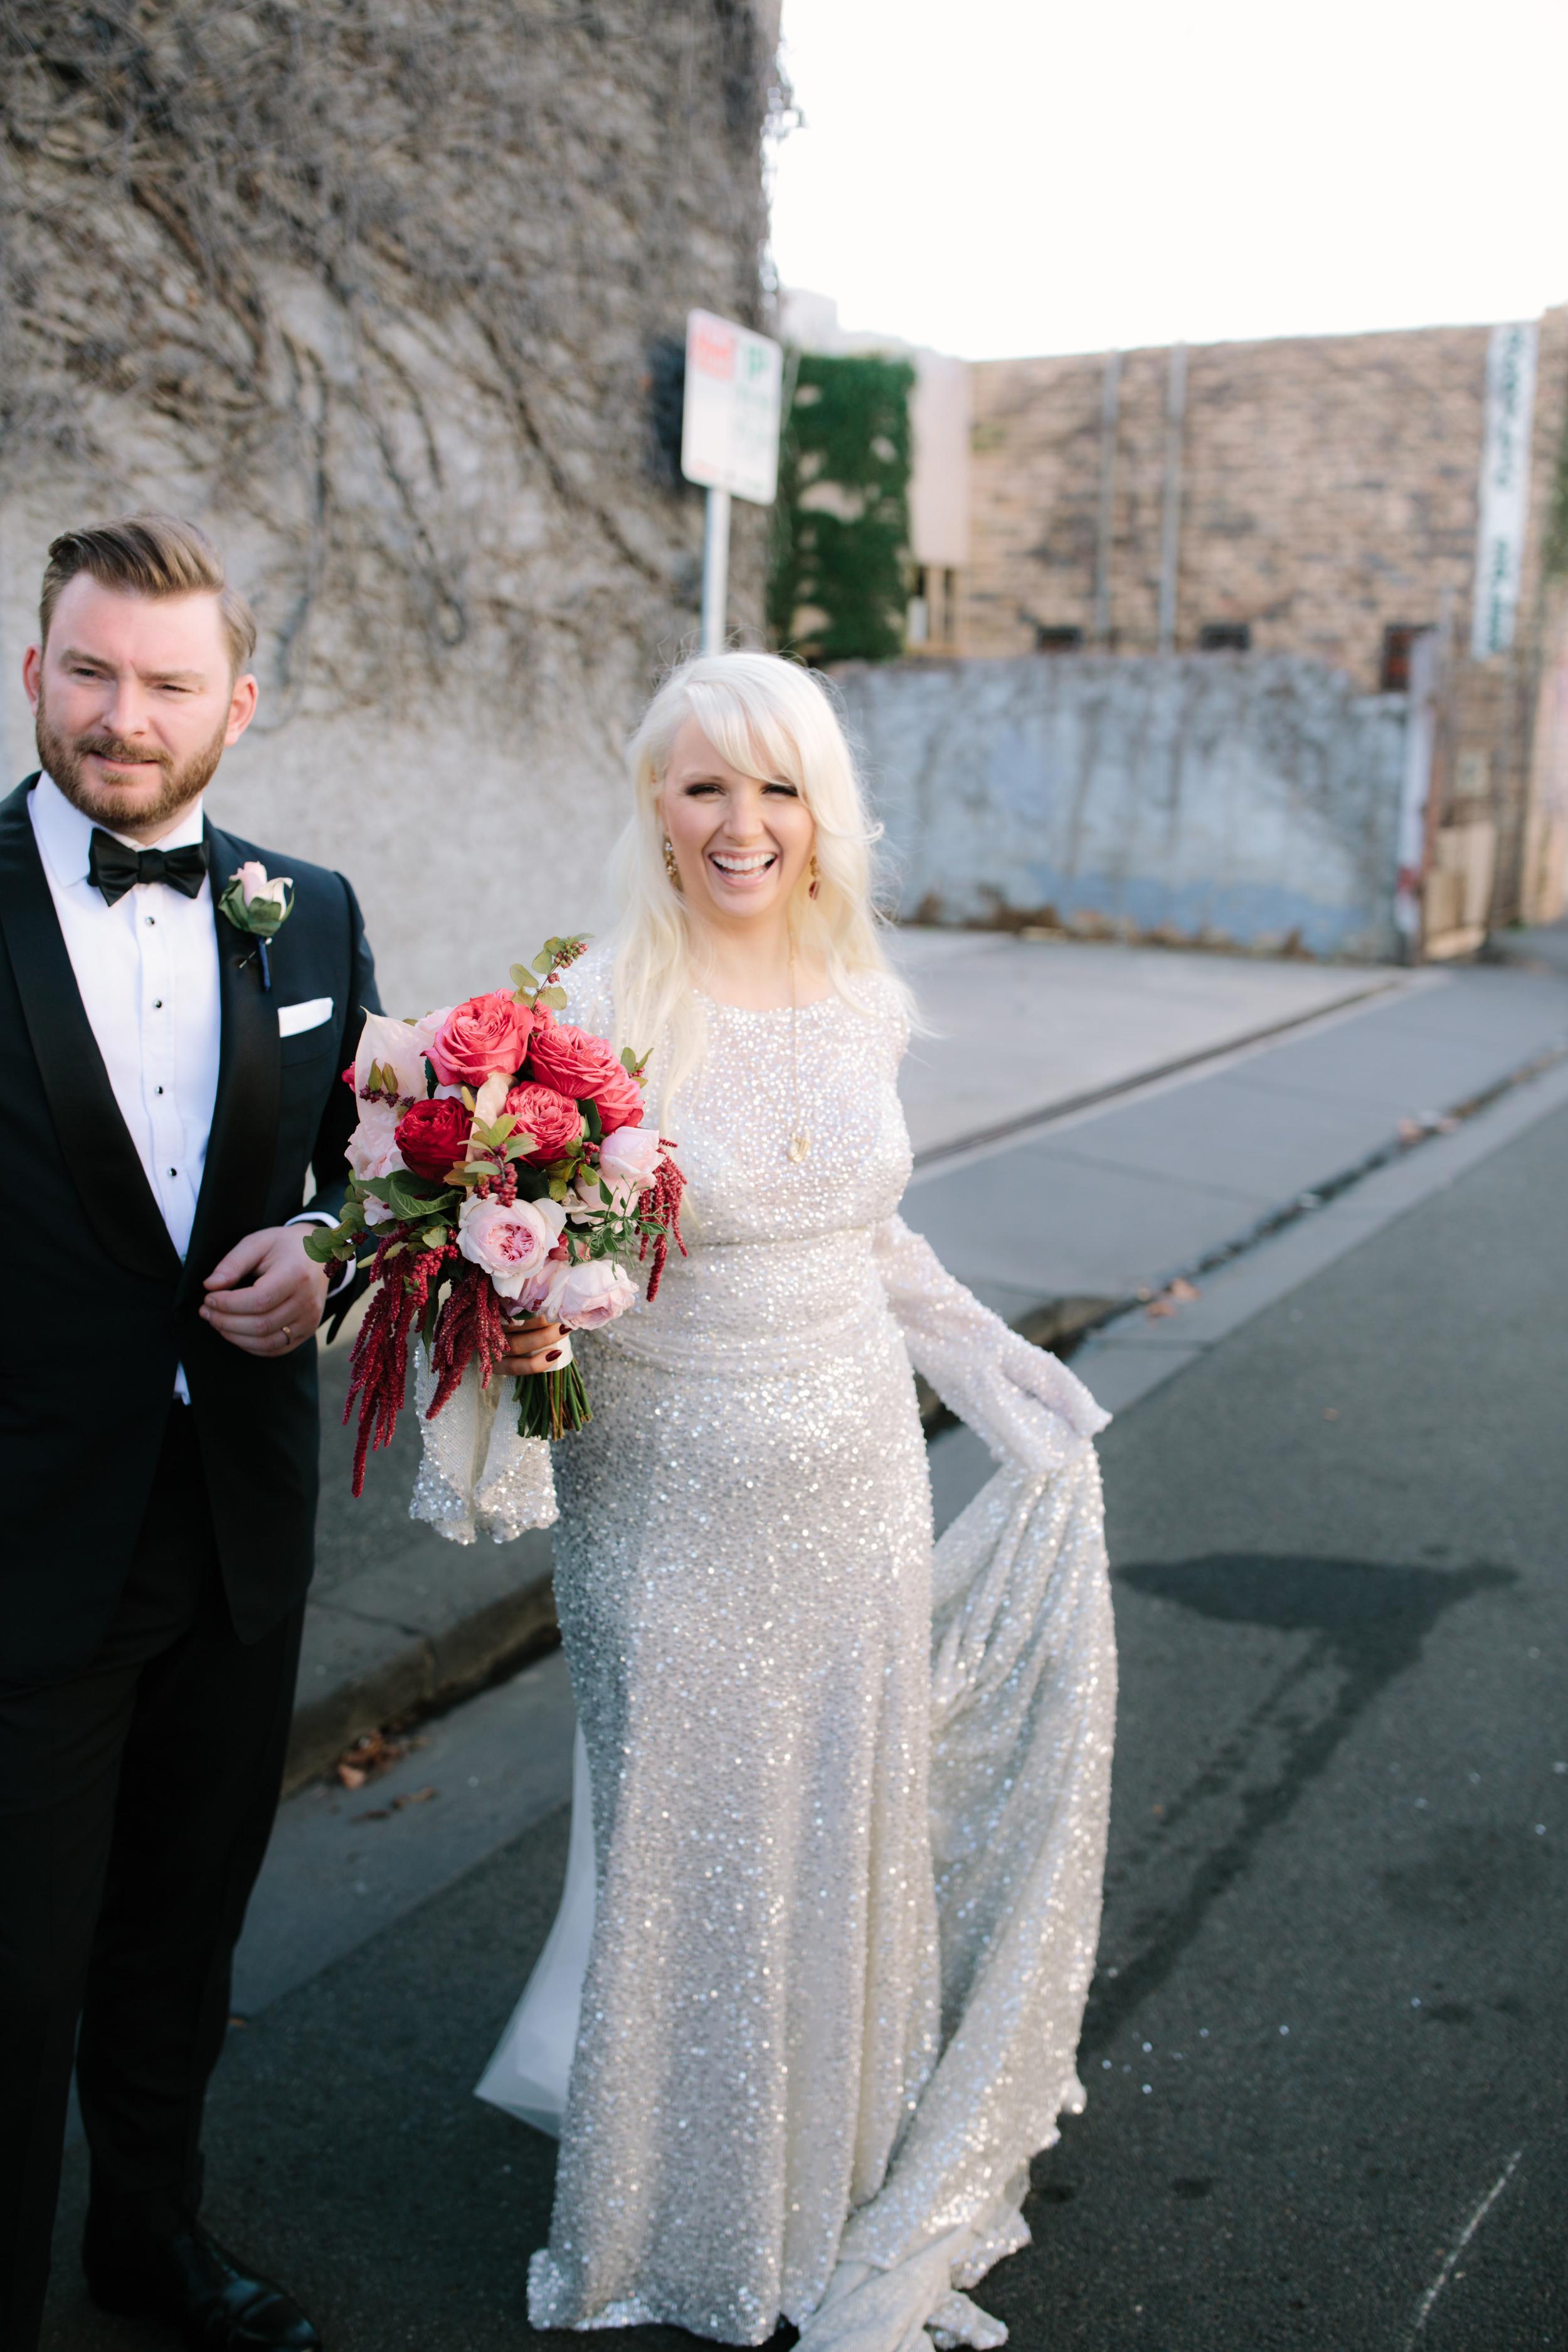 I-Got-You-Babe-Weddings-Tori-Will-Rupert0083.JPG